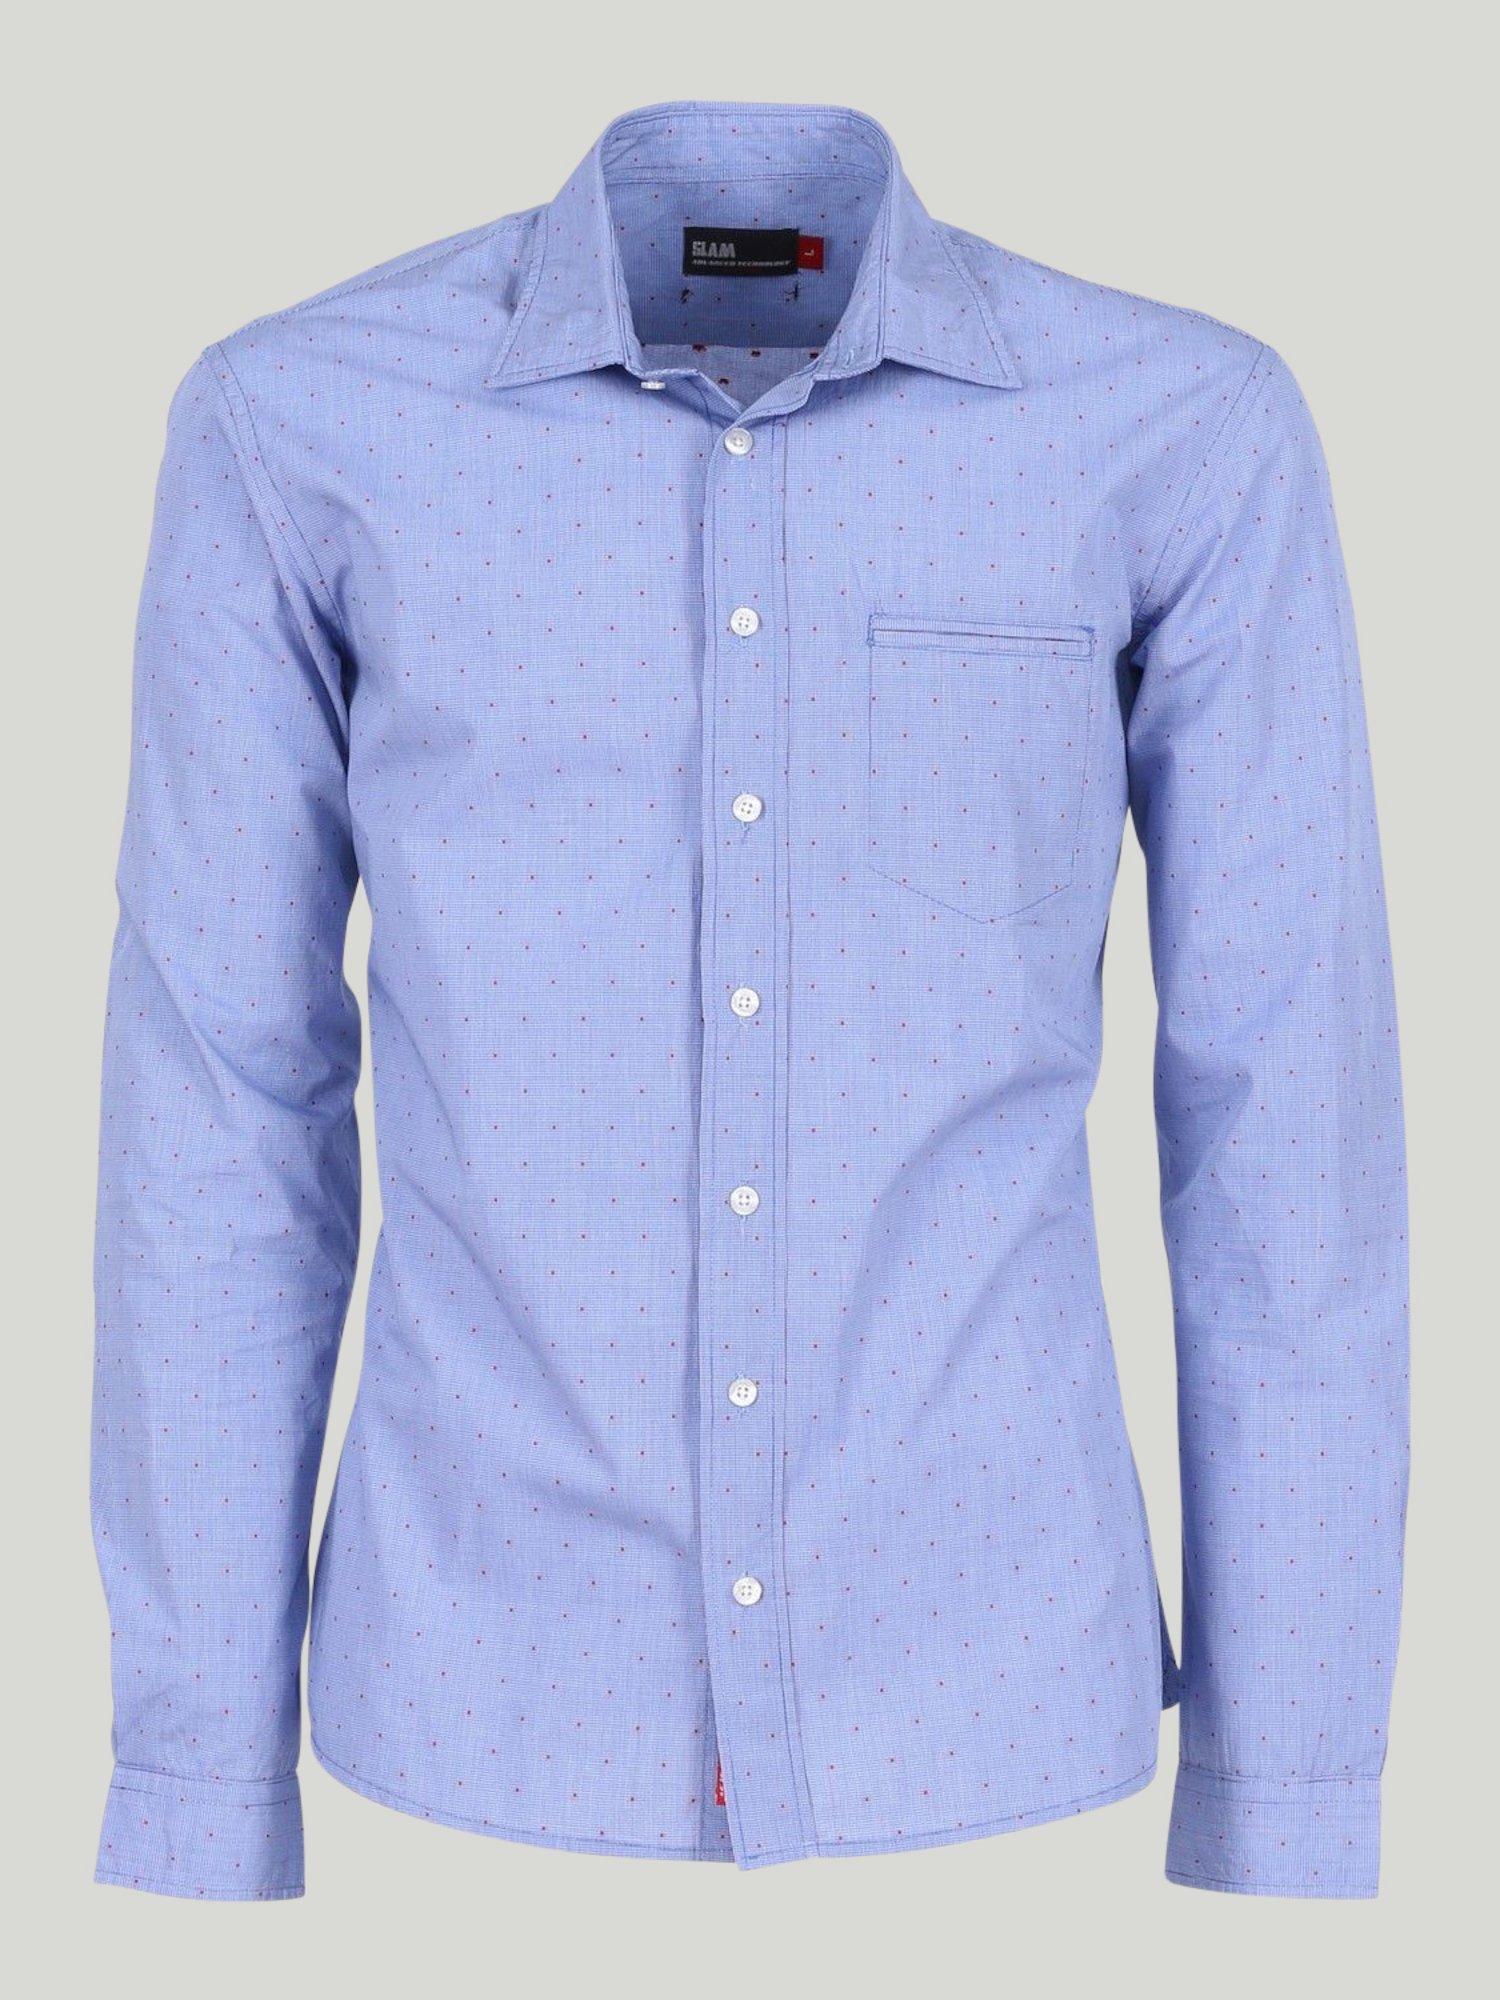 Shirt Founder - Microcheck Blue / White